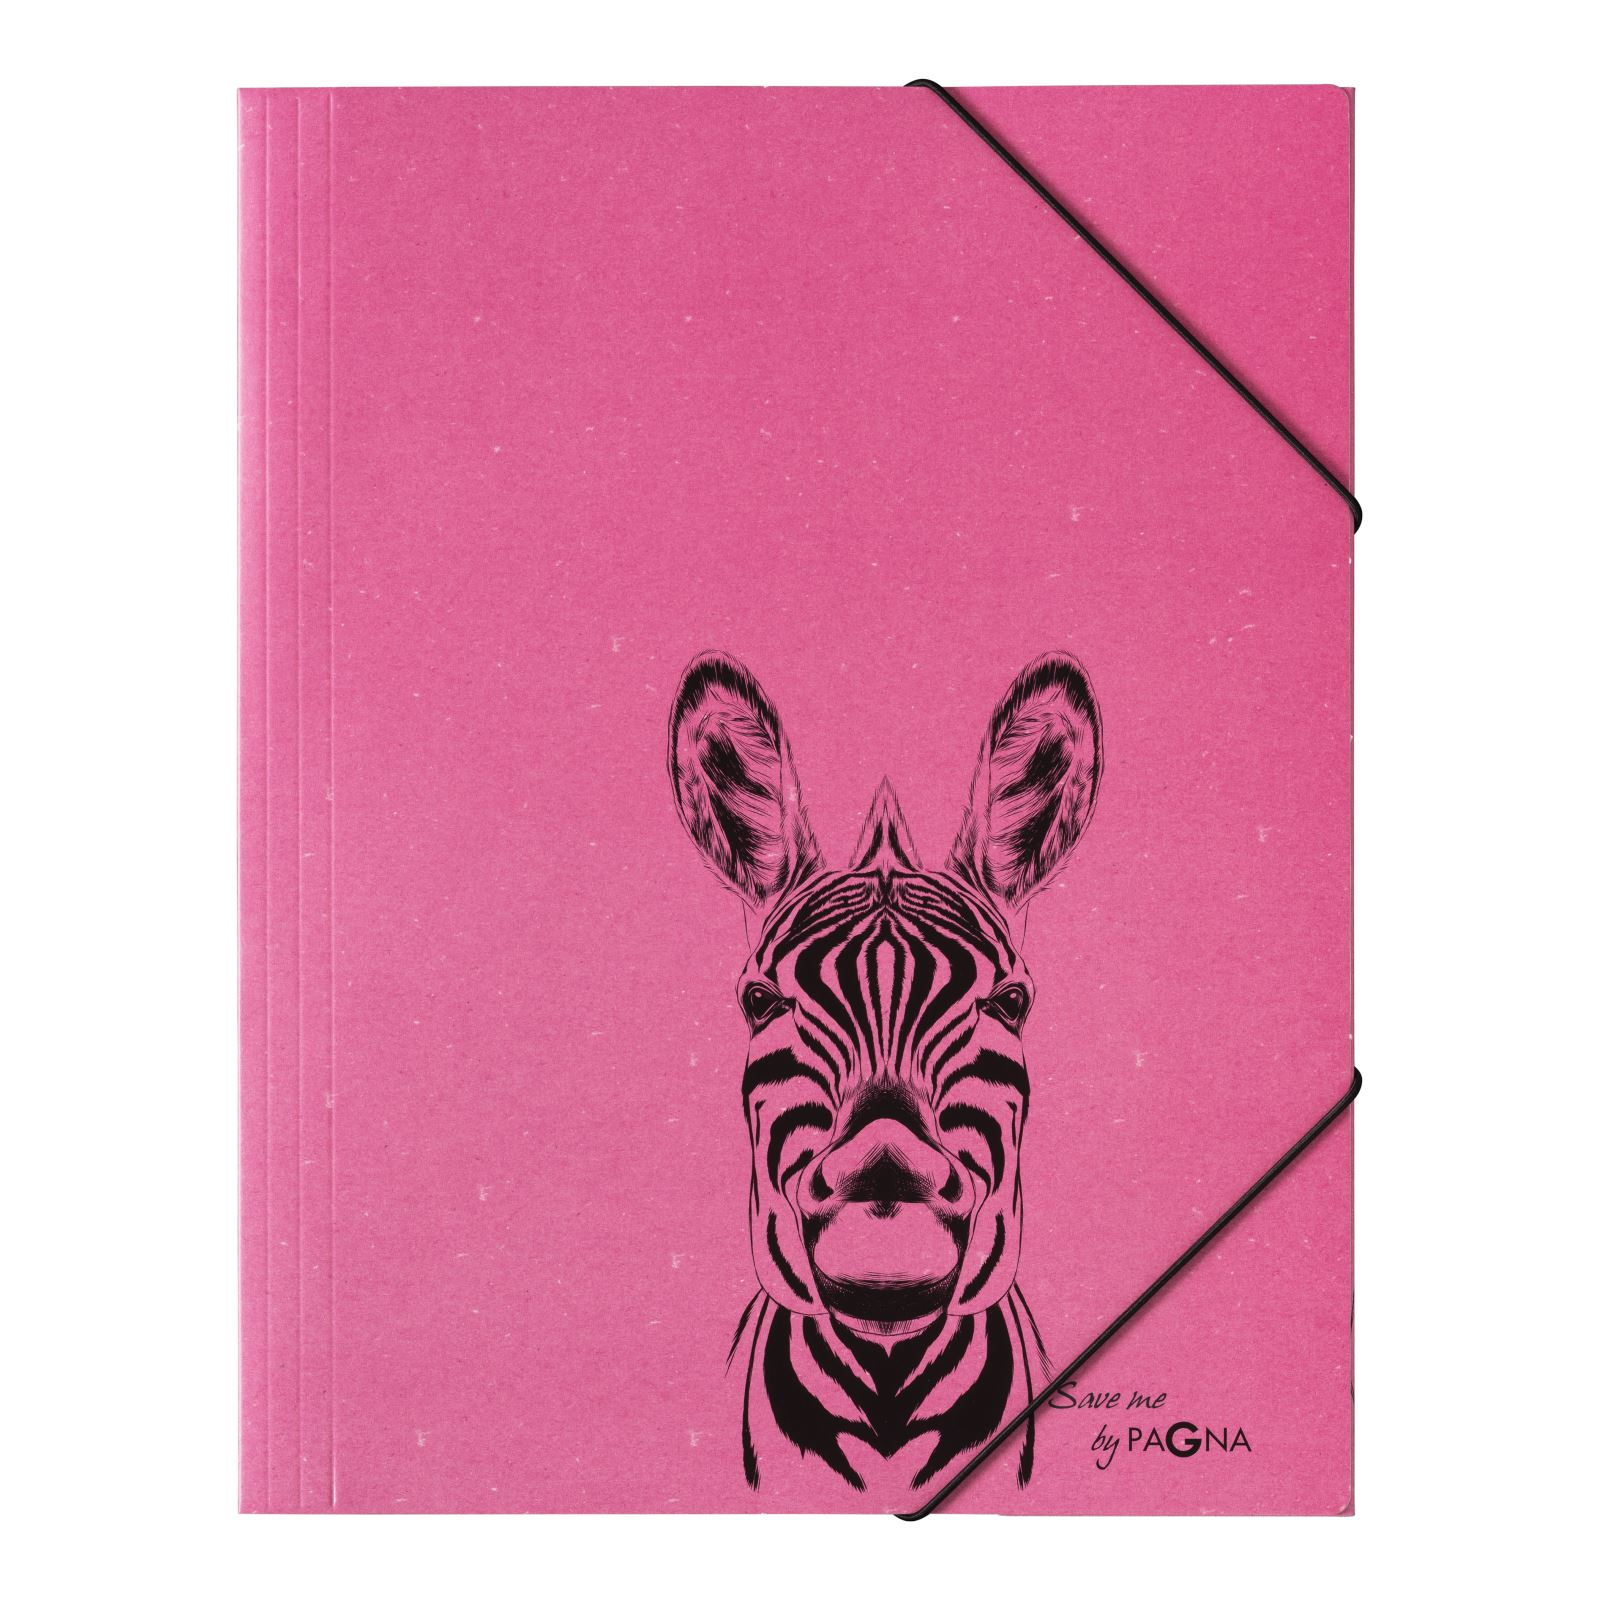 Pagna 21658-34 - Sammelmappe - Eckspanner - DIN A4 - Zebra Motiv